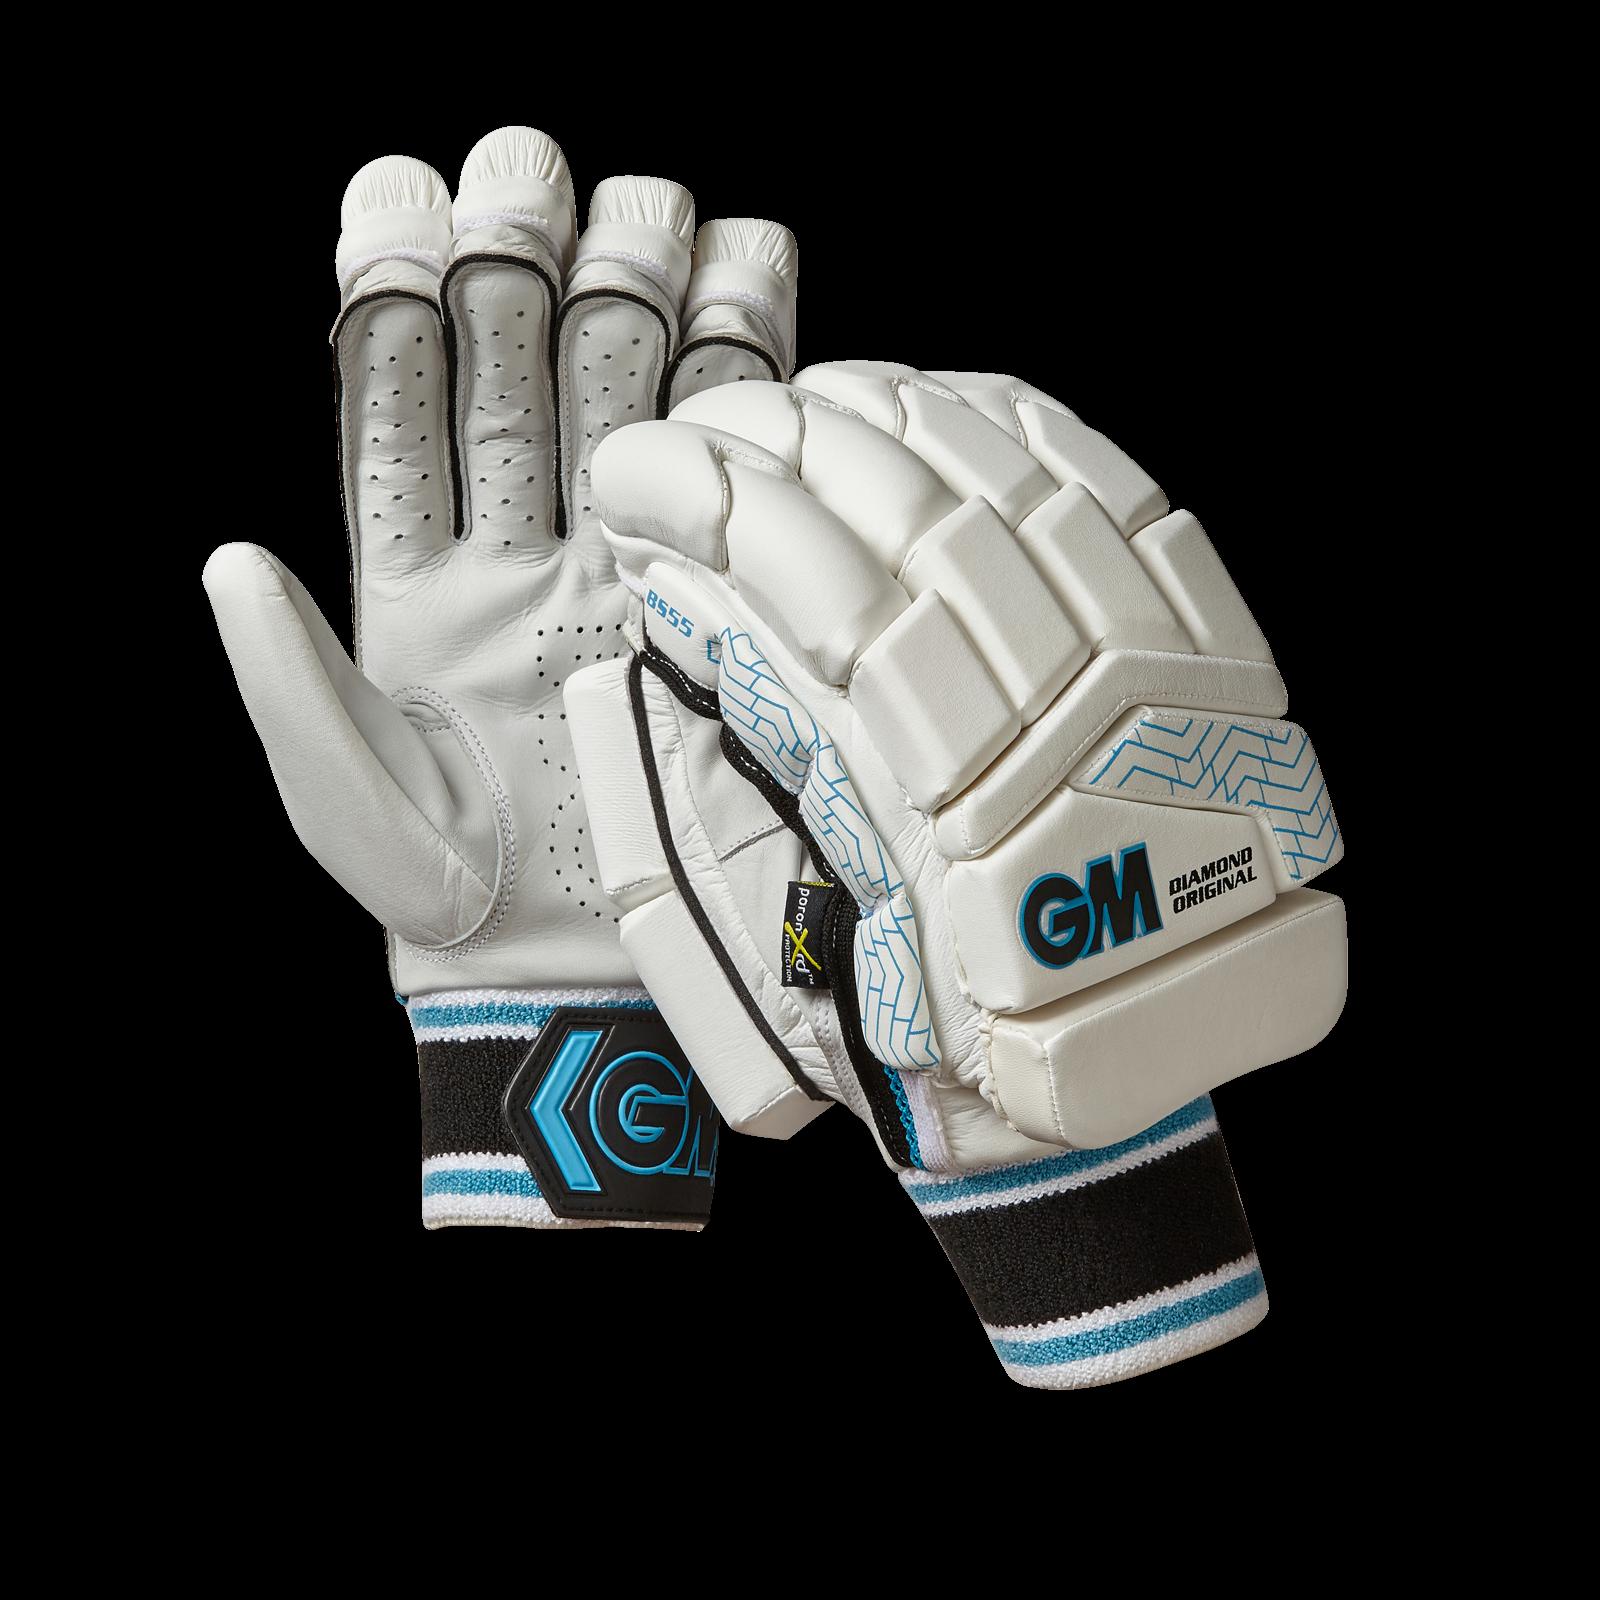 2021 Gunn and Moore Diamond Original Batting Gloves